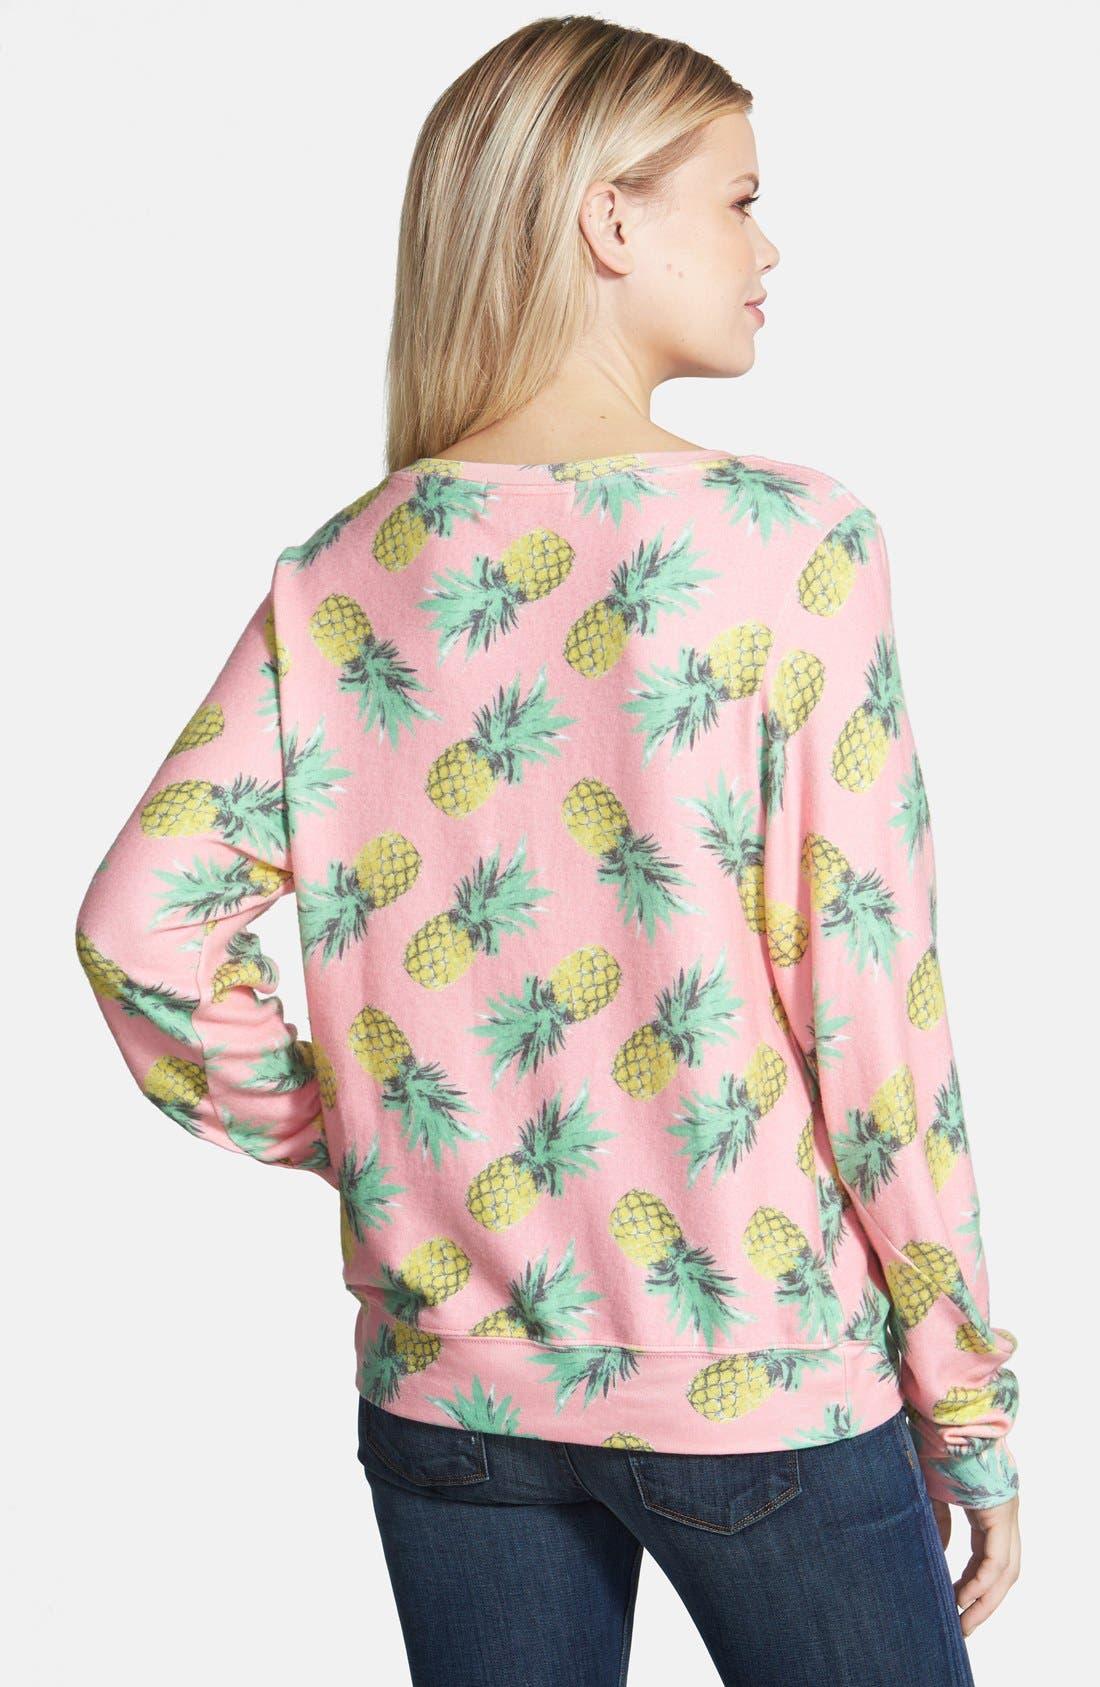 'Pineapple Palace' Sweatshirt,                             Alternate thumbnail 5, color,                             690